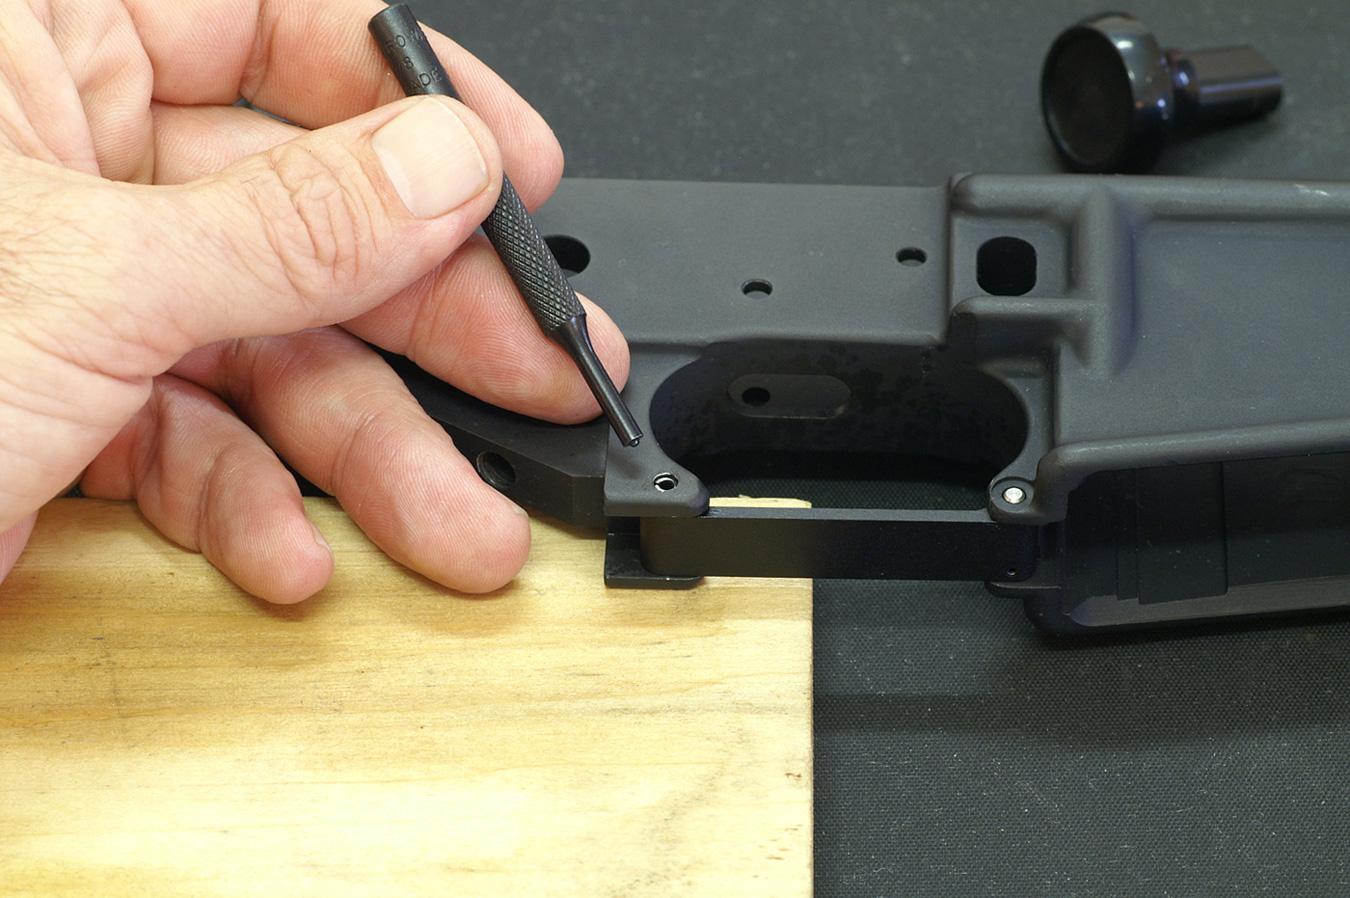 Ar 15 Maintenance Roll Pins